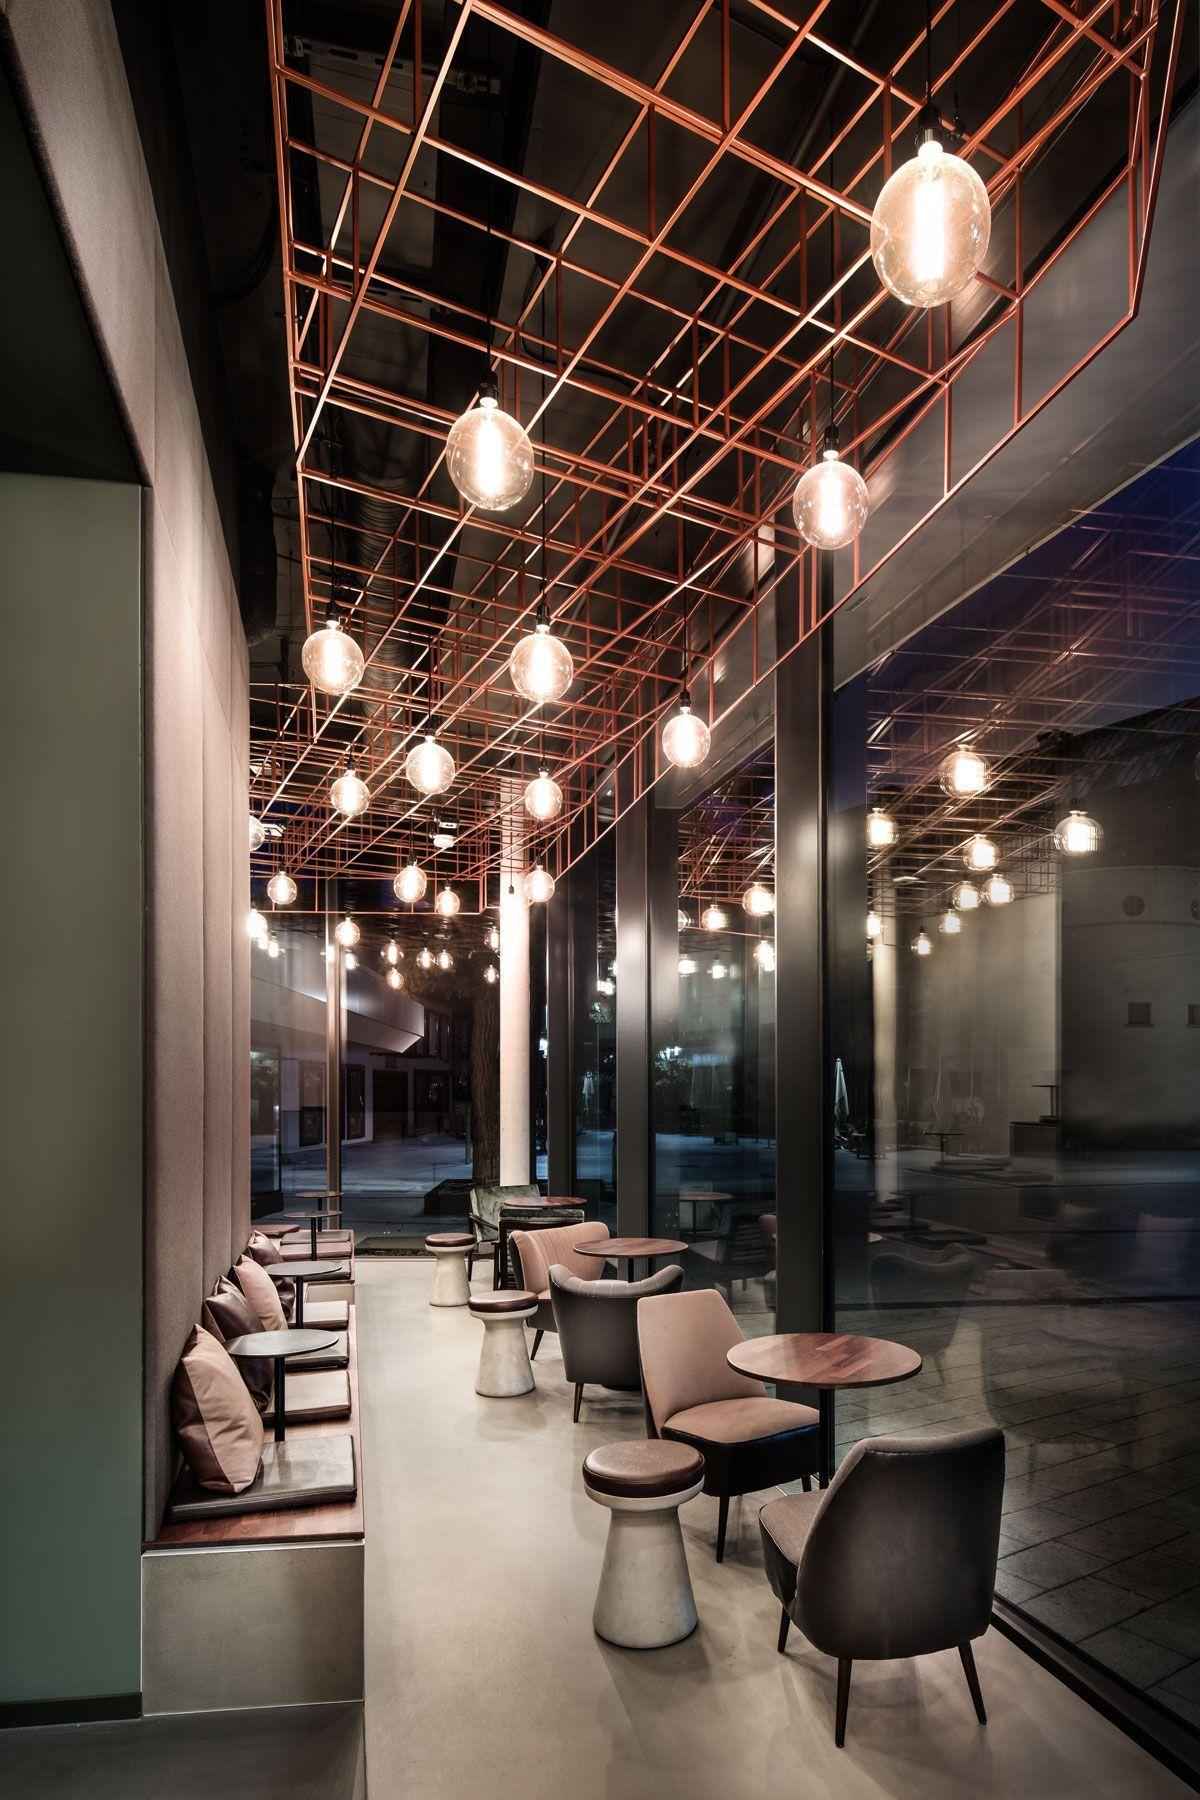 bar, lifestyle, interior design, industrial floor, cooper, rustic, seating area, light bulb